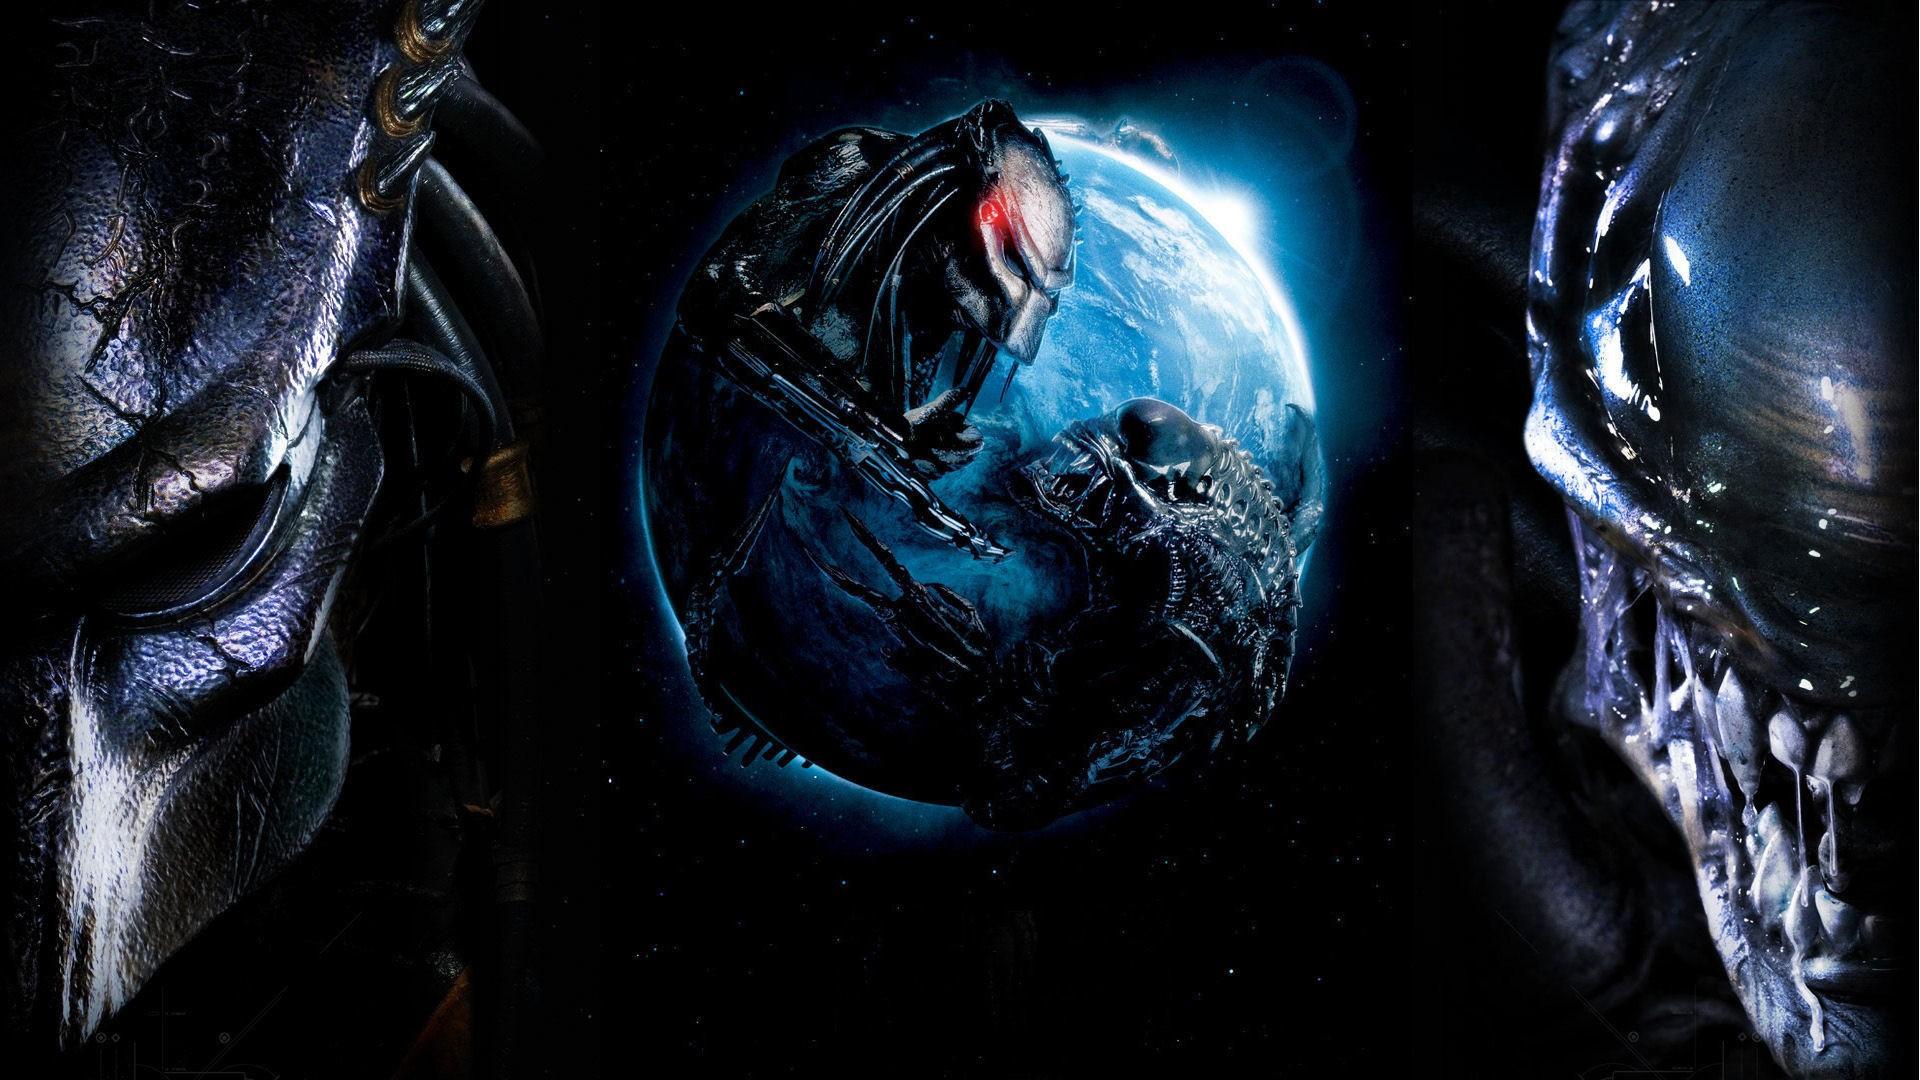 Wallpaper di Alien Vs. Predator